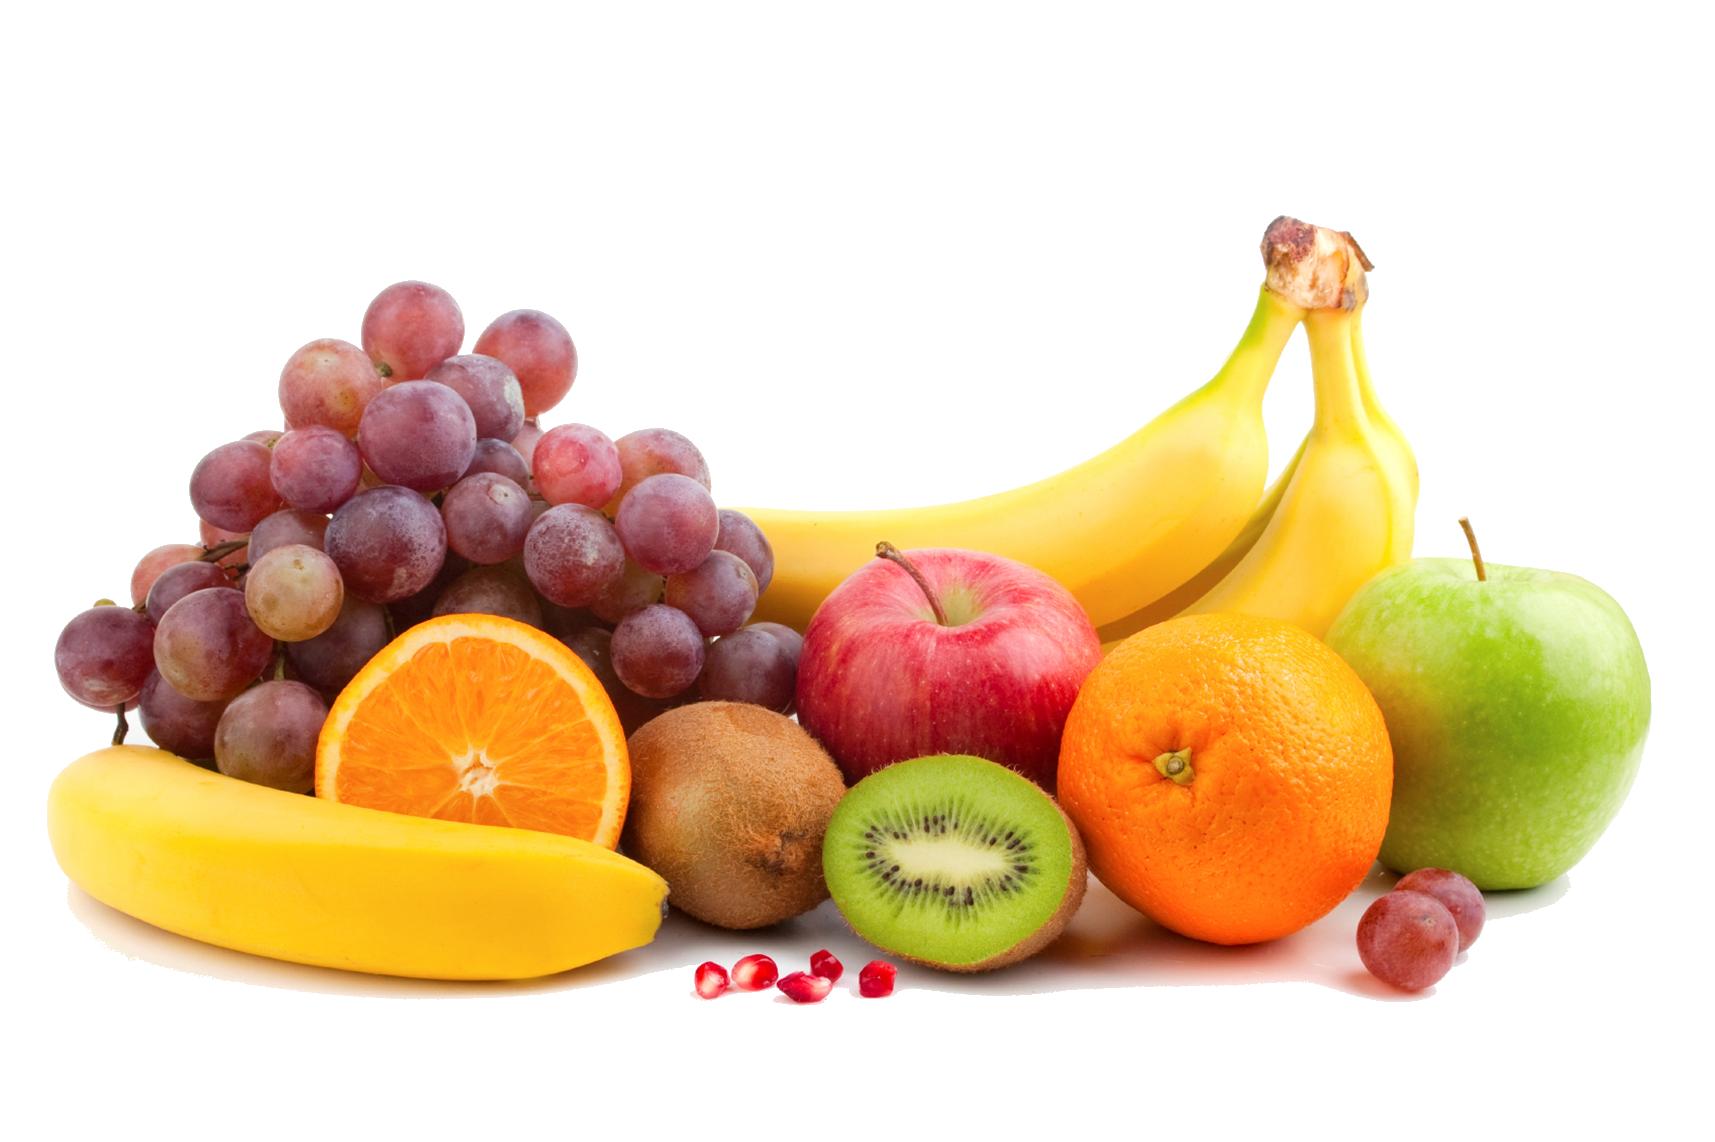 Fruit PNG Transparent Images.